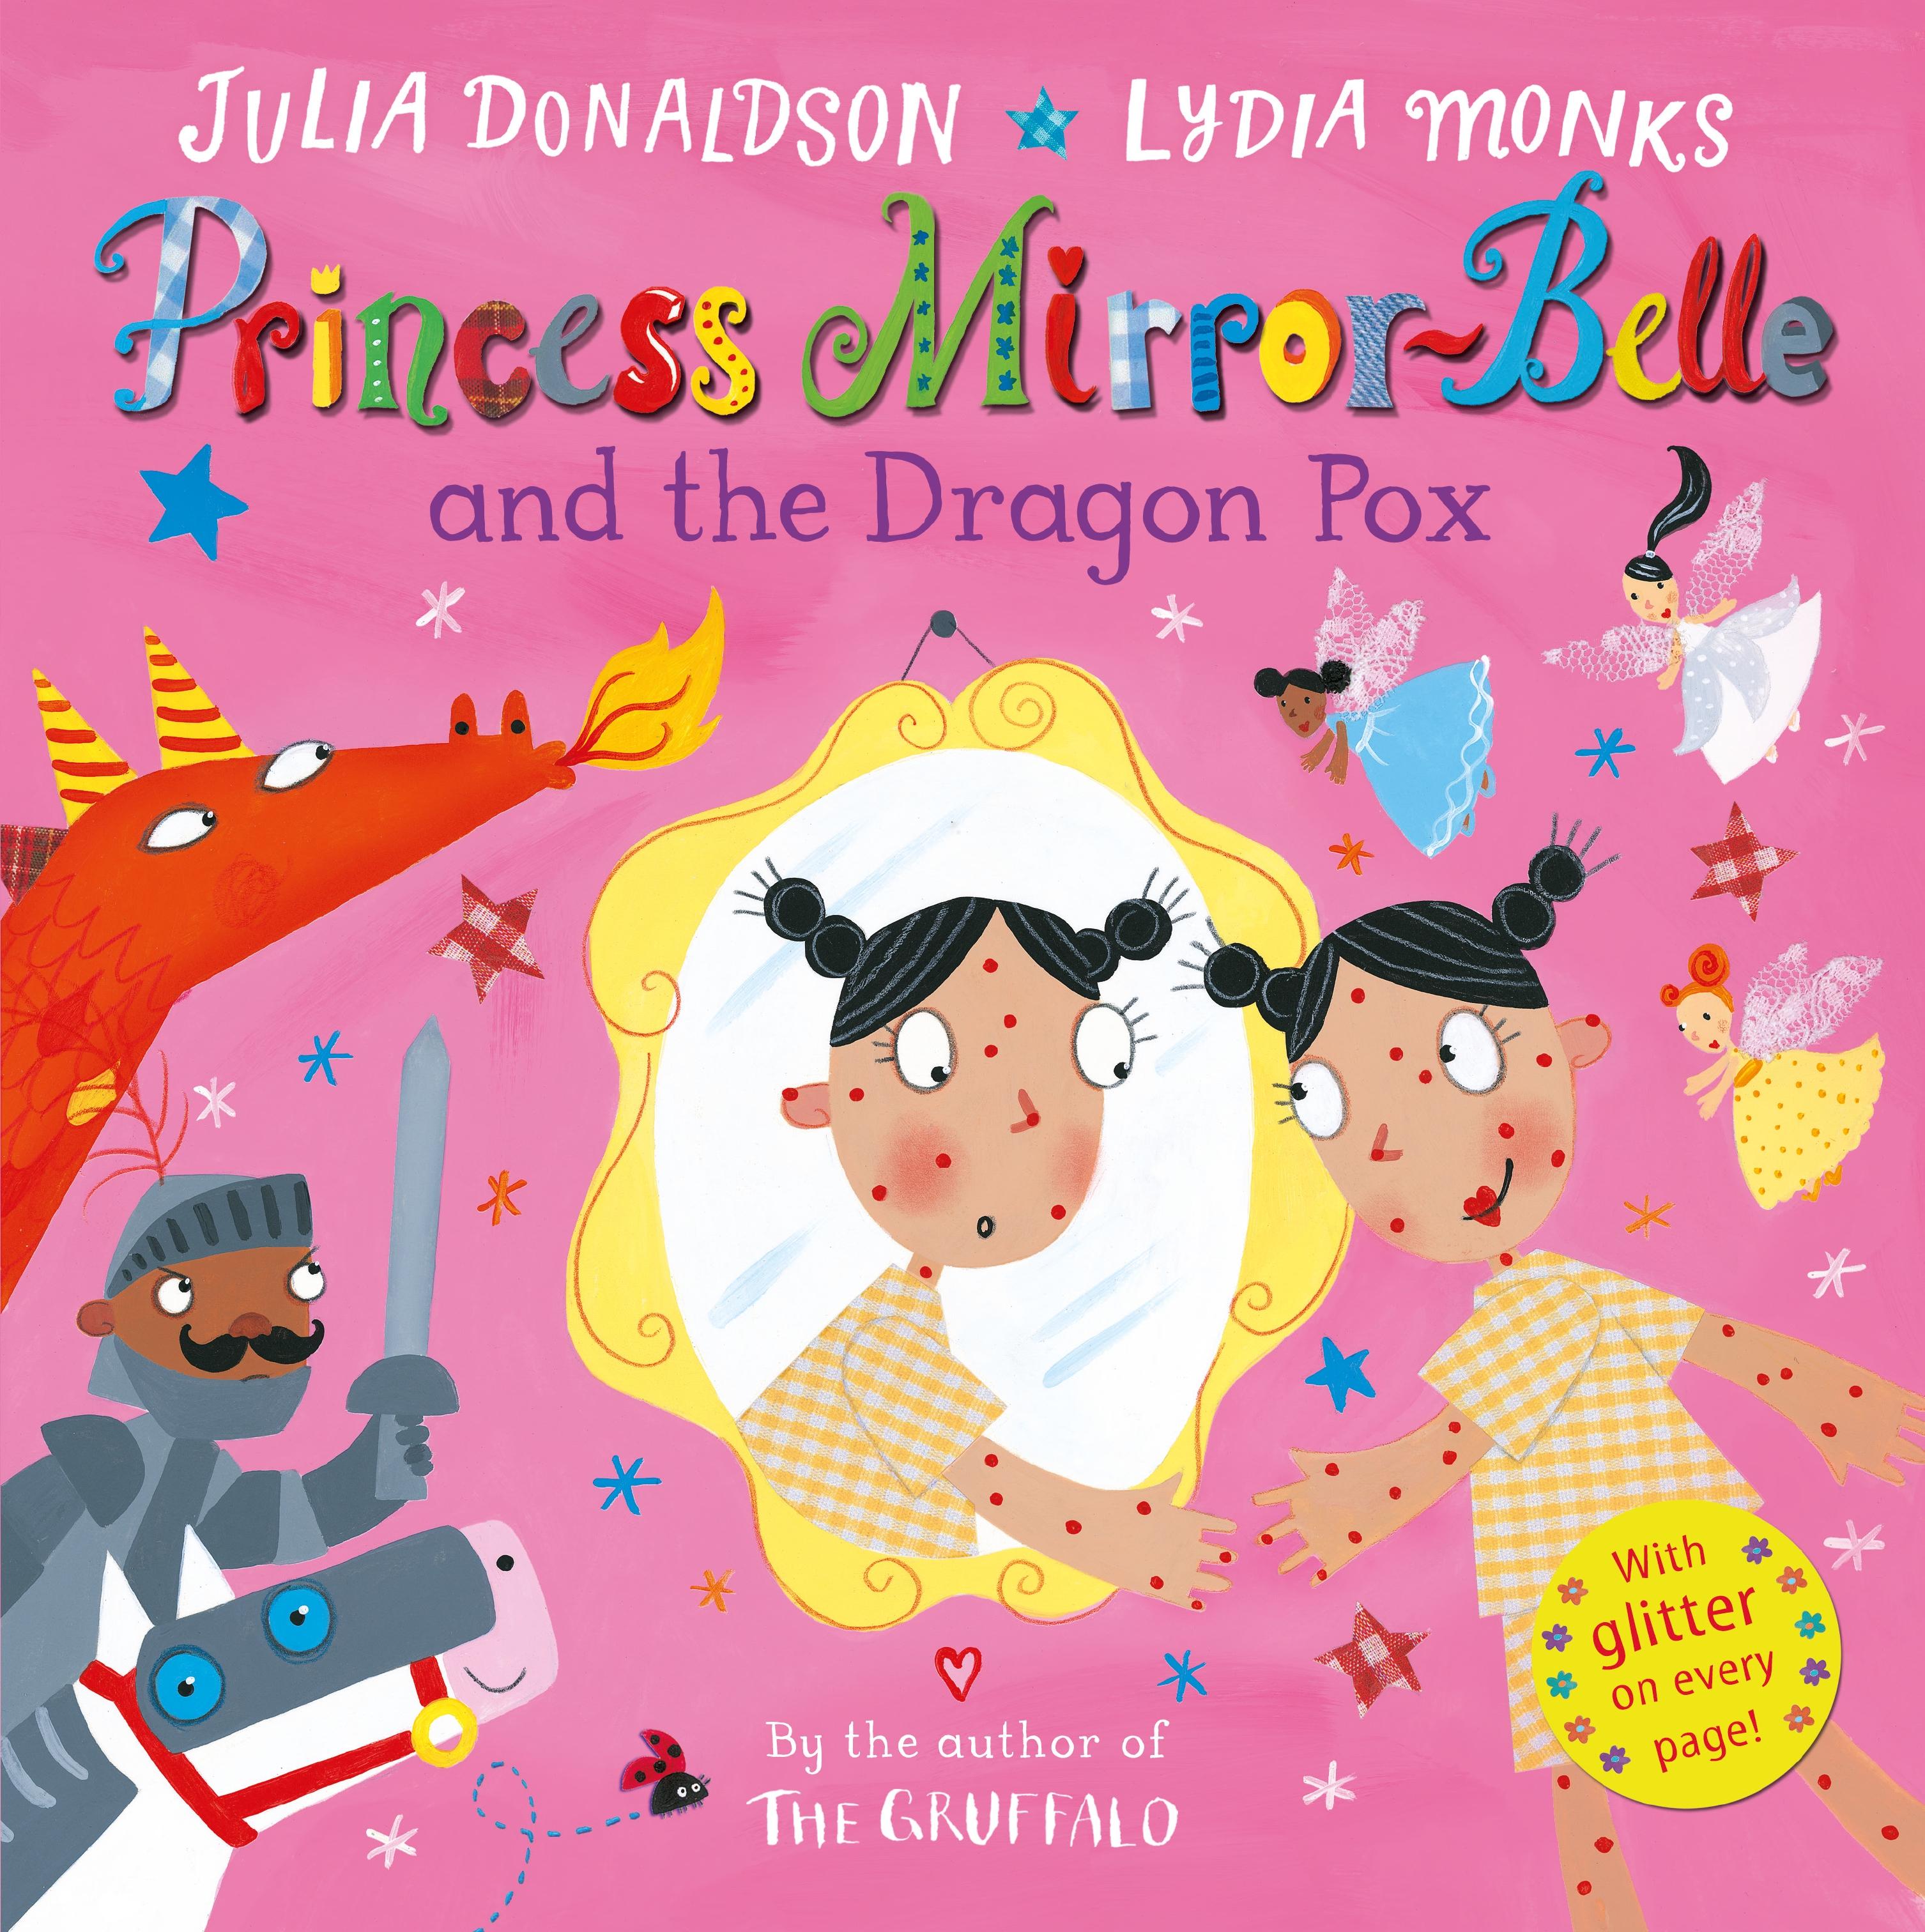 Julia Donaldson Princess Mirror-Belle and the Dragon Pox